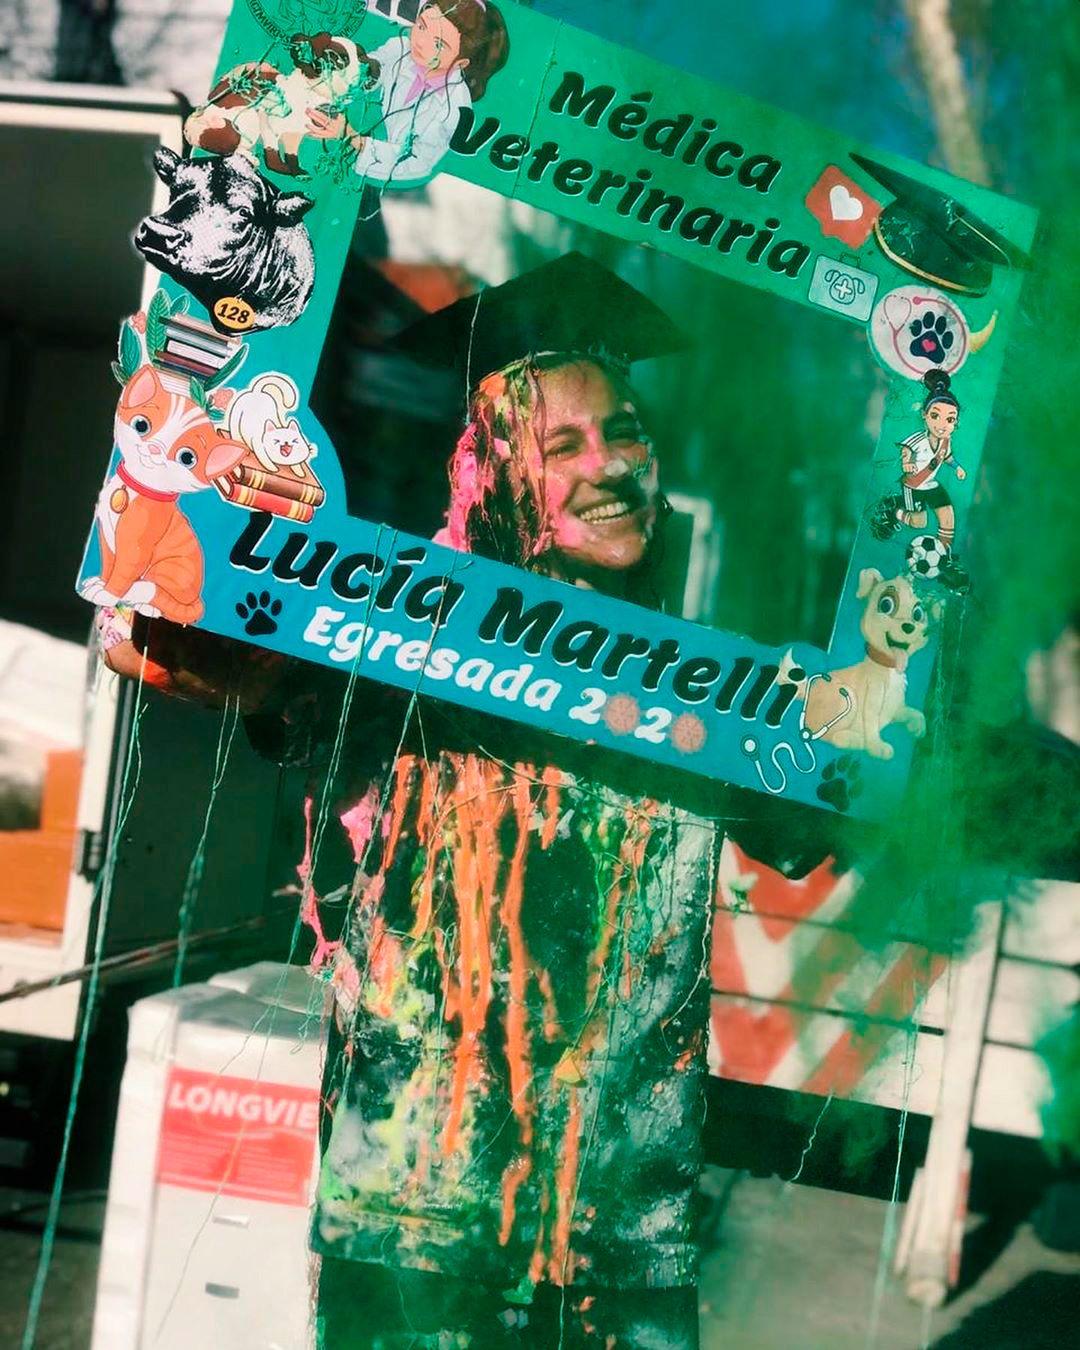 Lucia Martelli